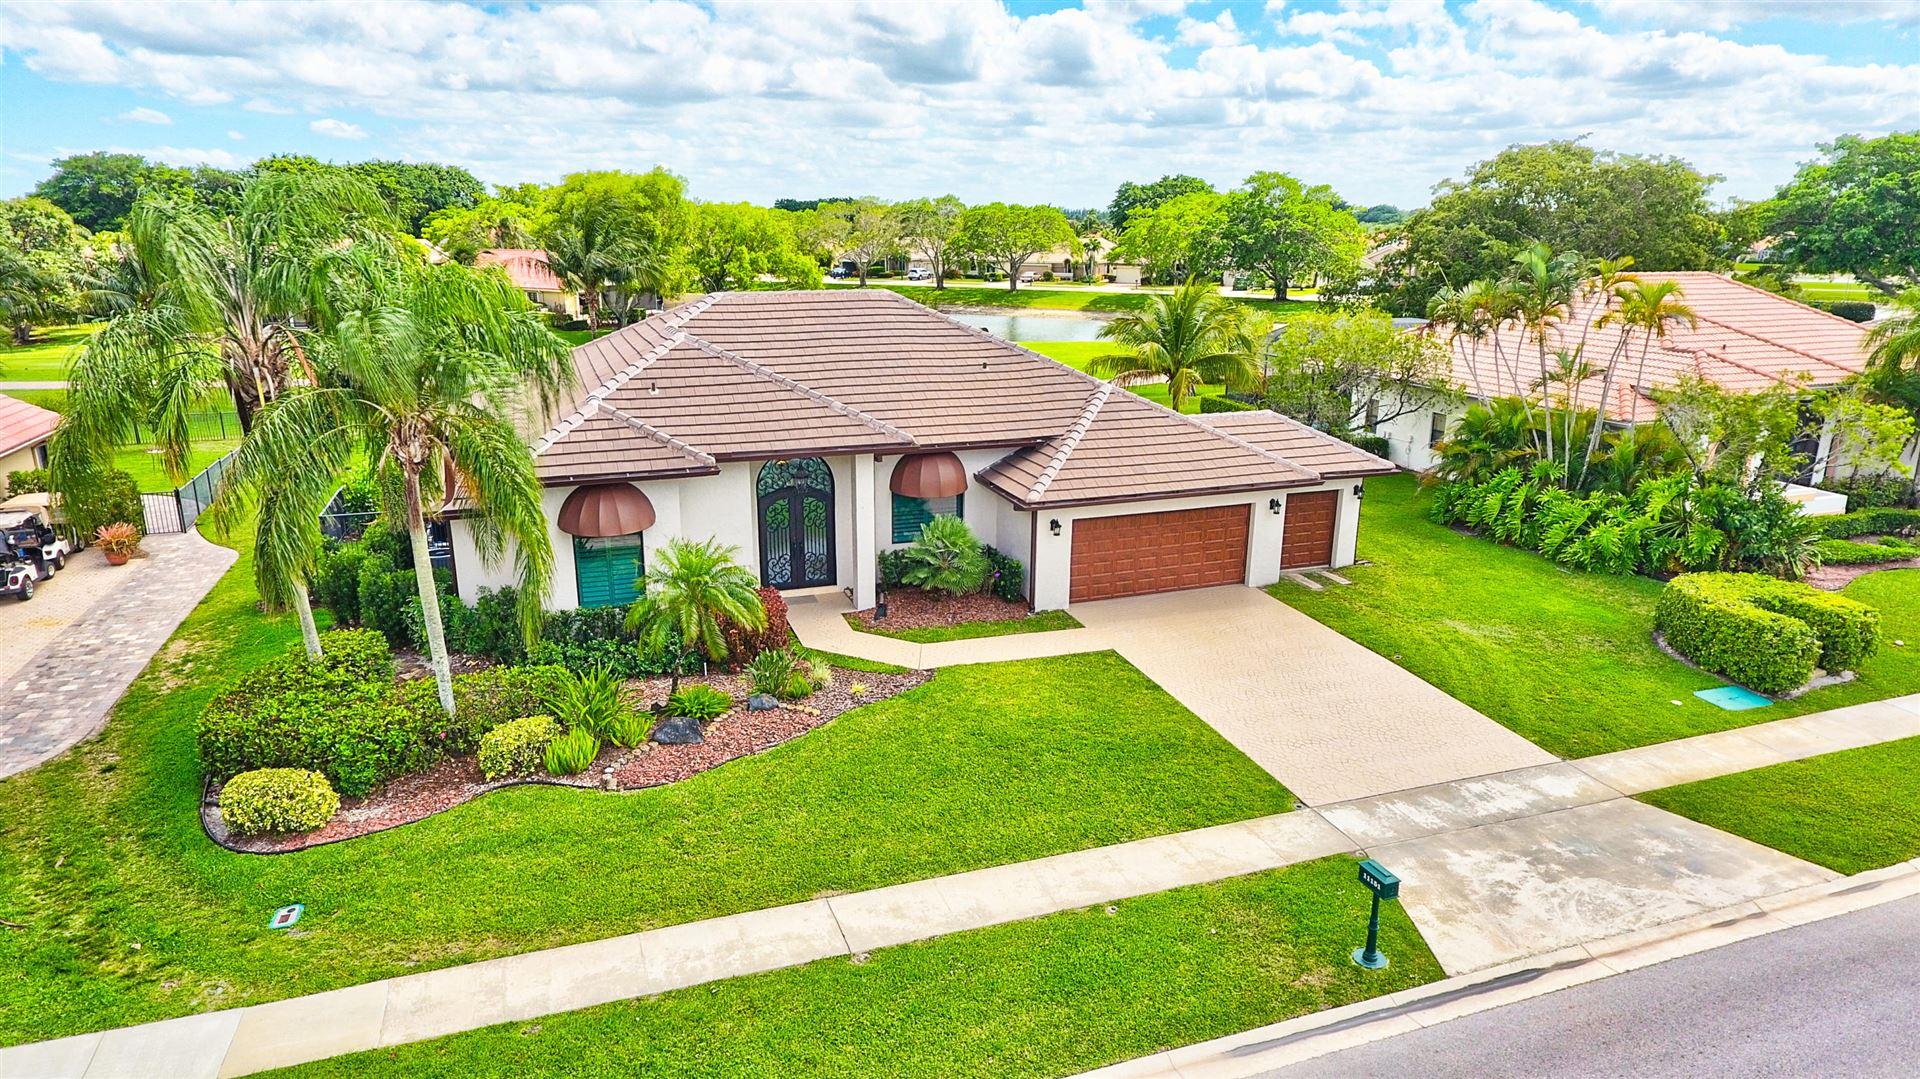 11151 Boca Woods Lane, Boca Raton, FL 33428 - MLS#: RX-10712190